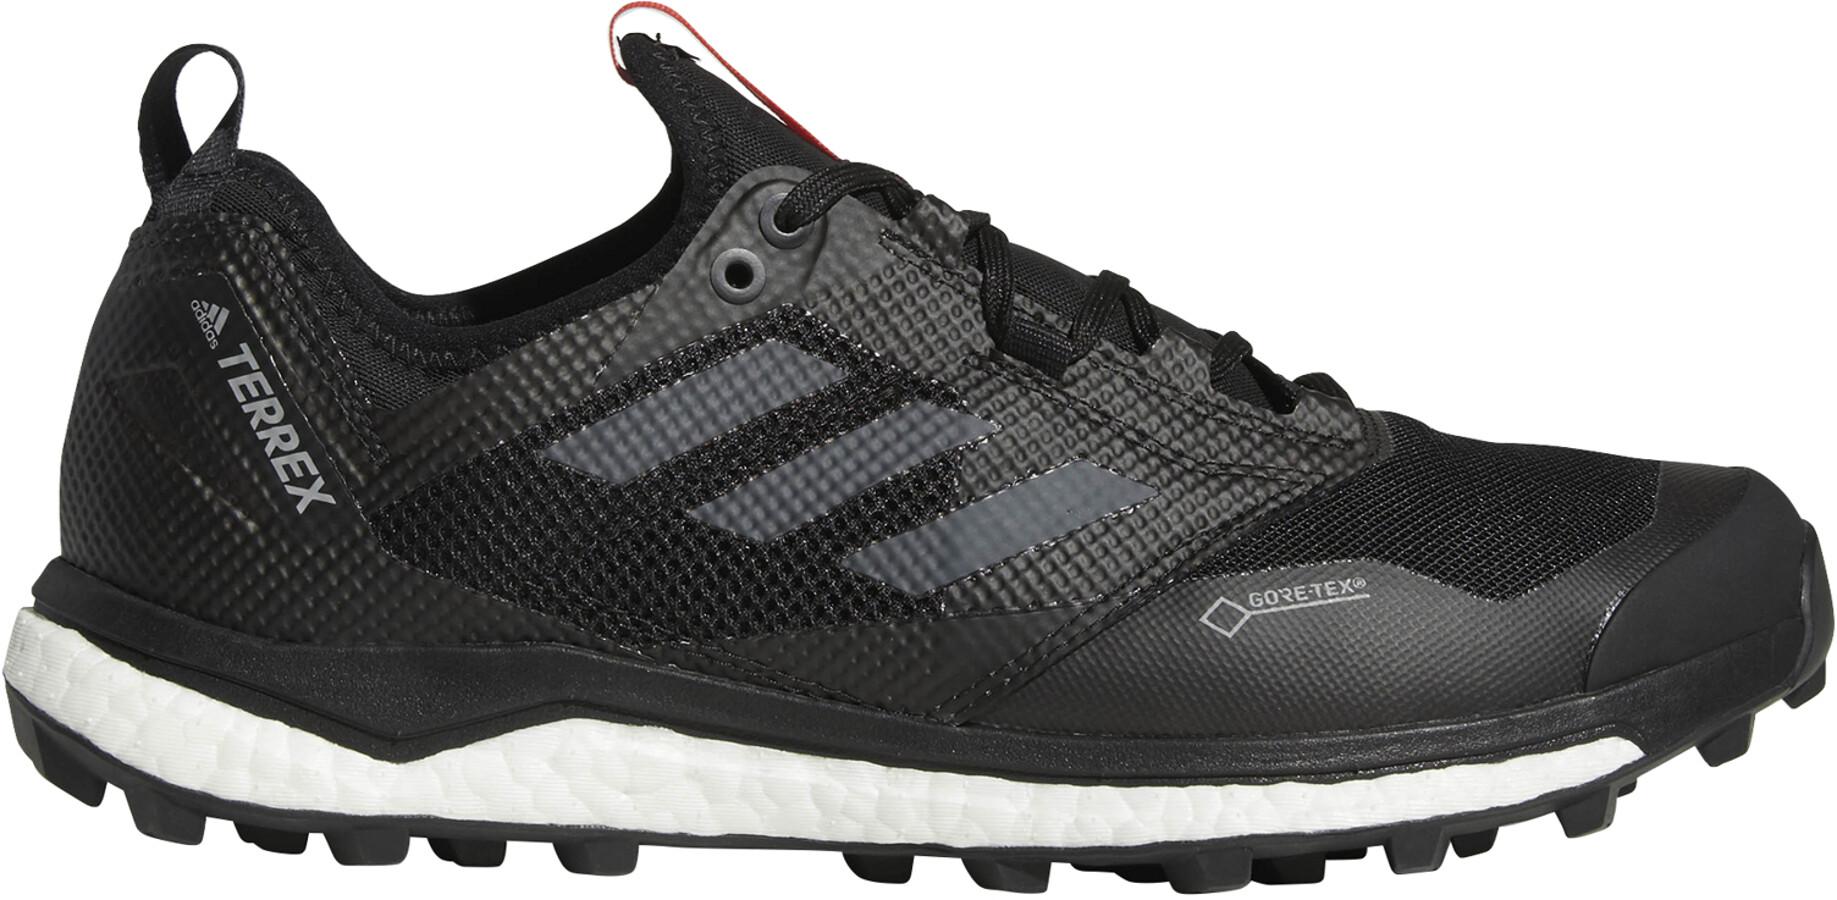 adidas TERREX Agravic XT GTX Sko Herrer, core black/grey five/hi-res red (2019)   Shoes and overlays